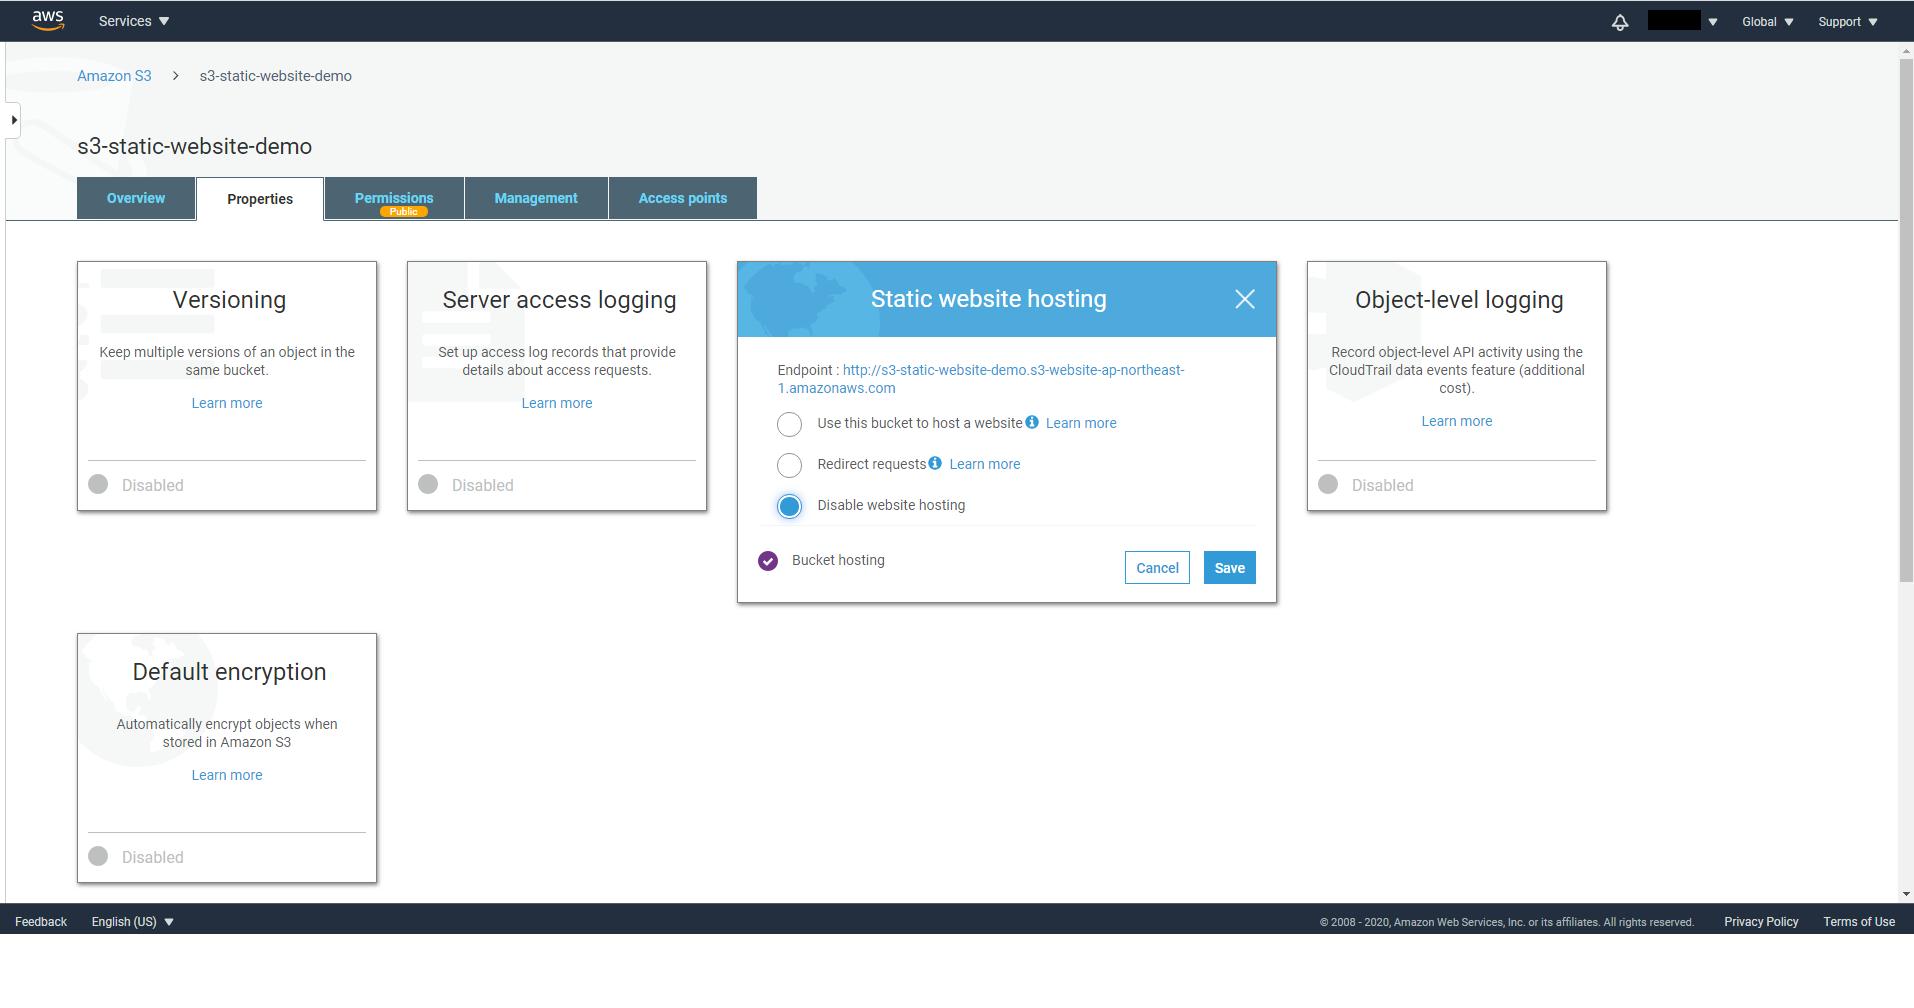 Disable S3 static website hosting